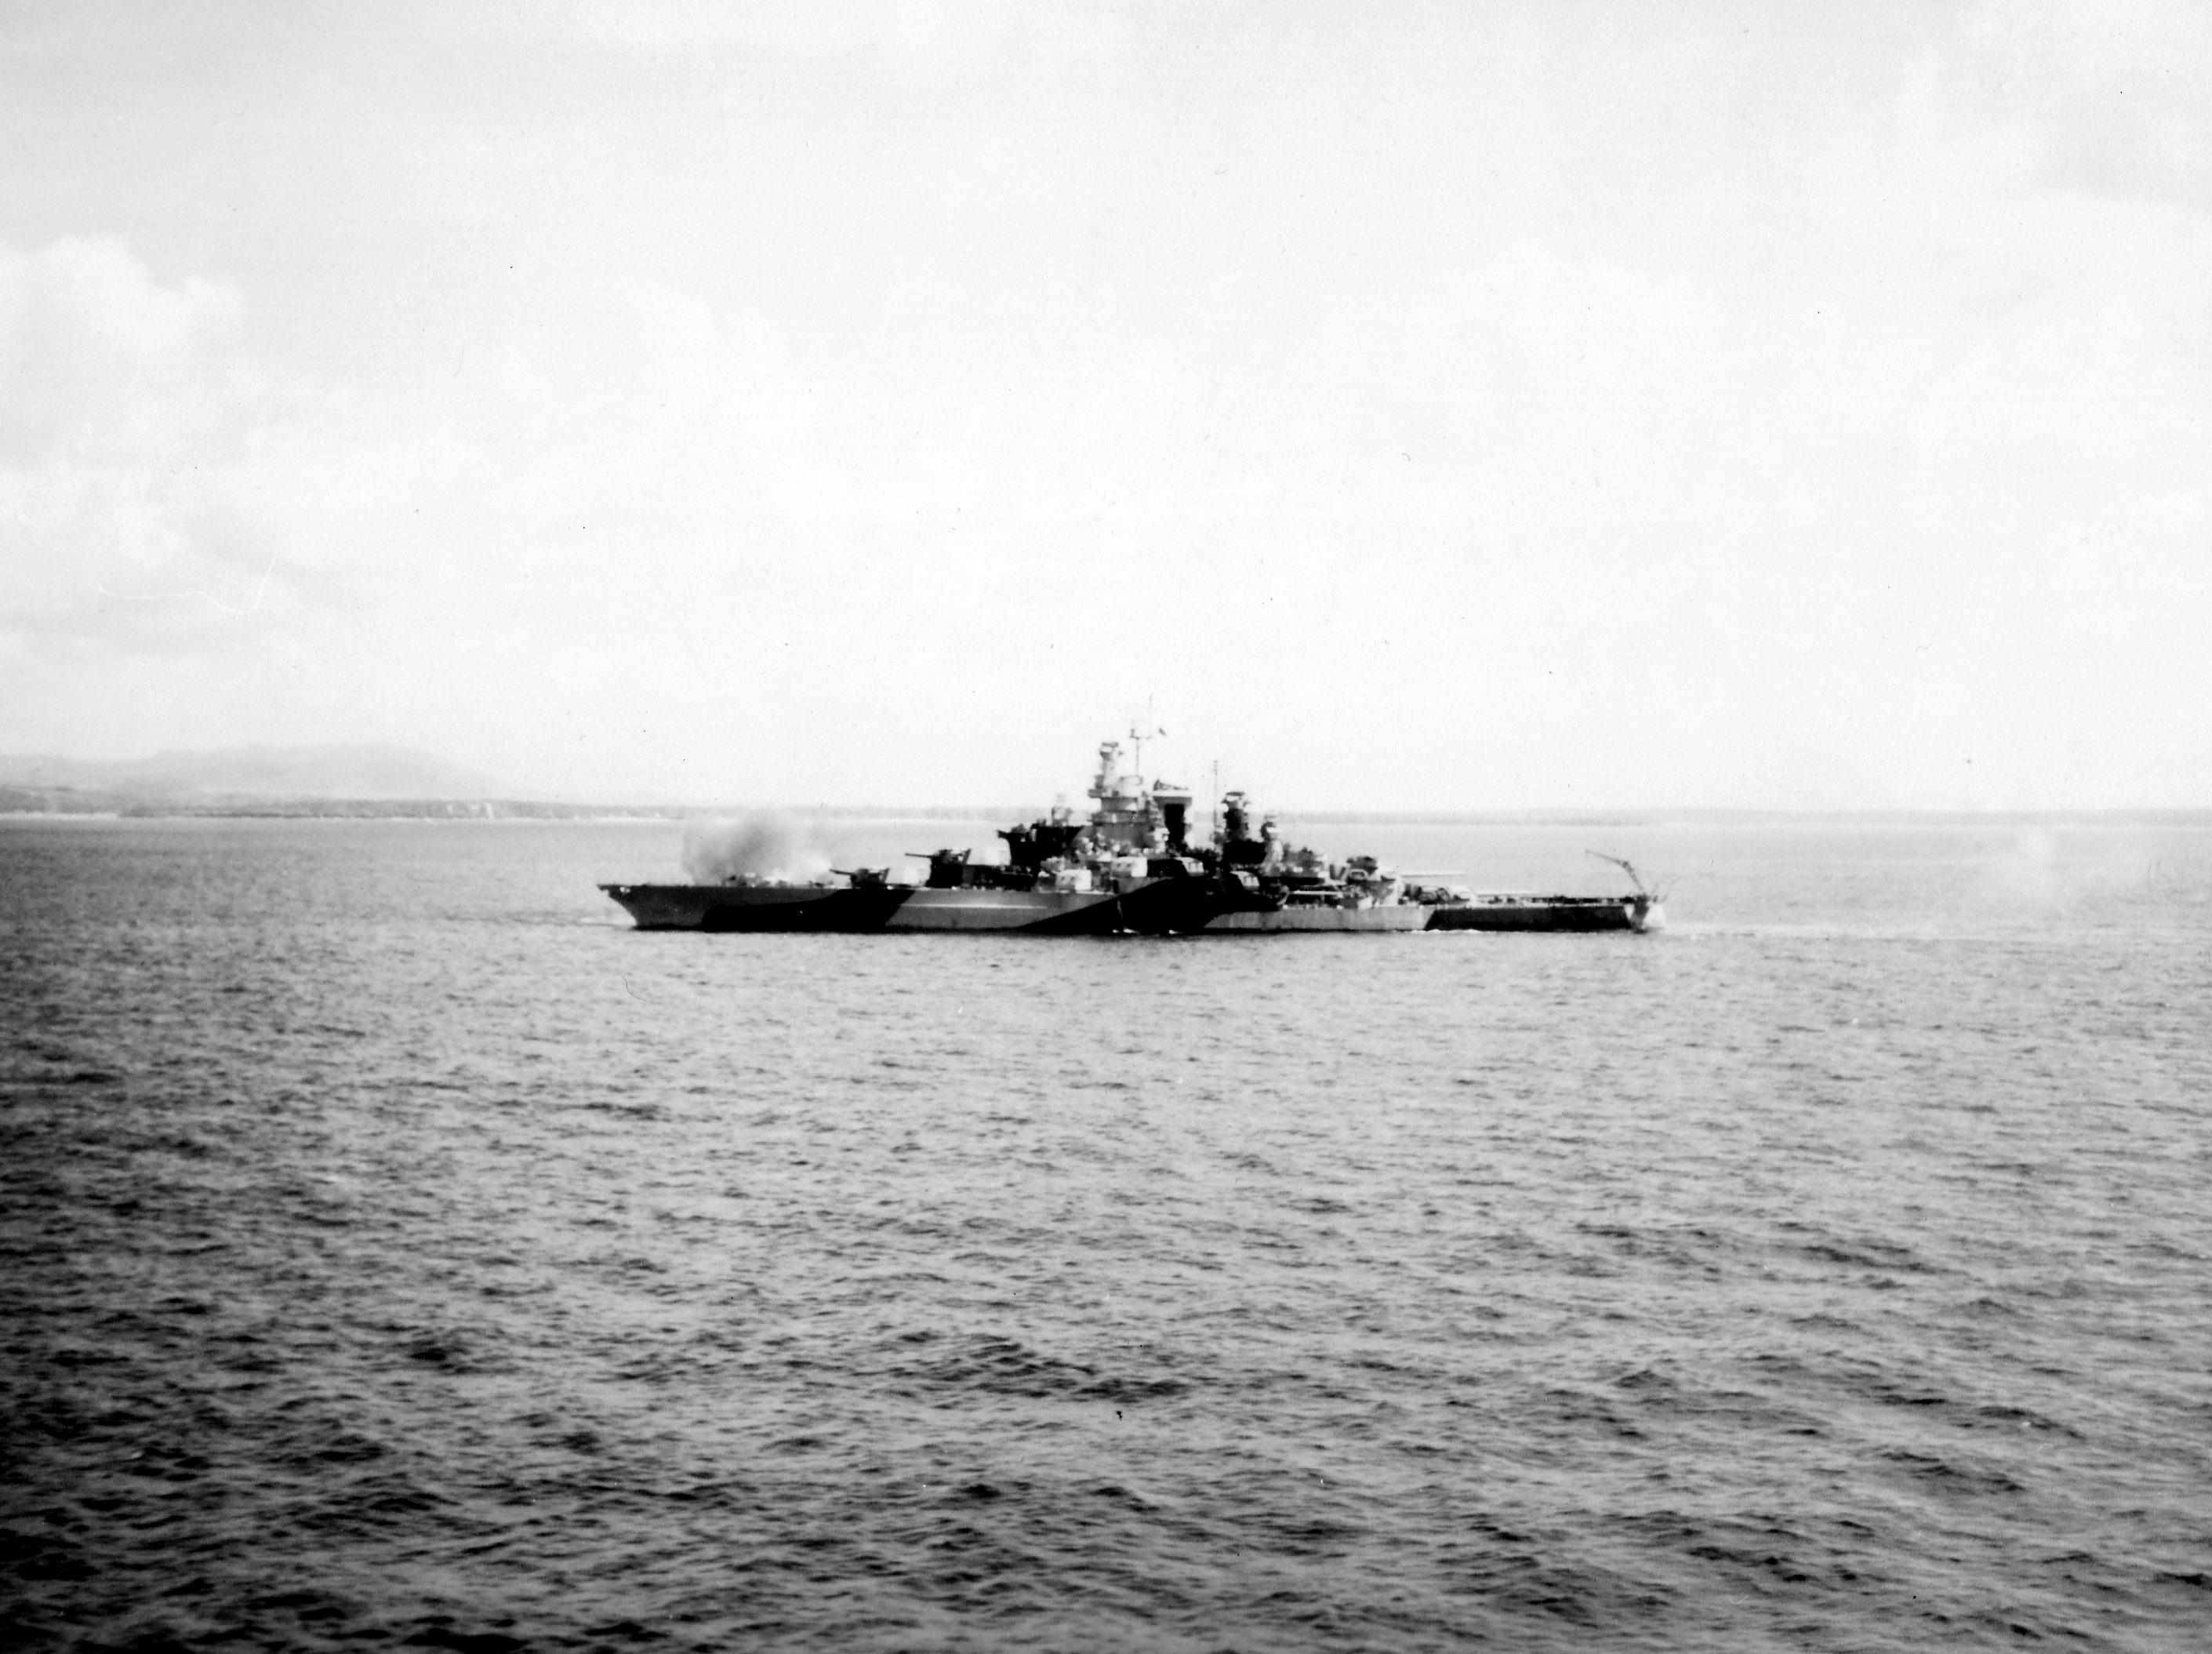 File:USS Tennessee bombarding Guam.jpg